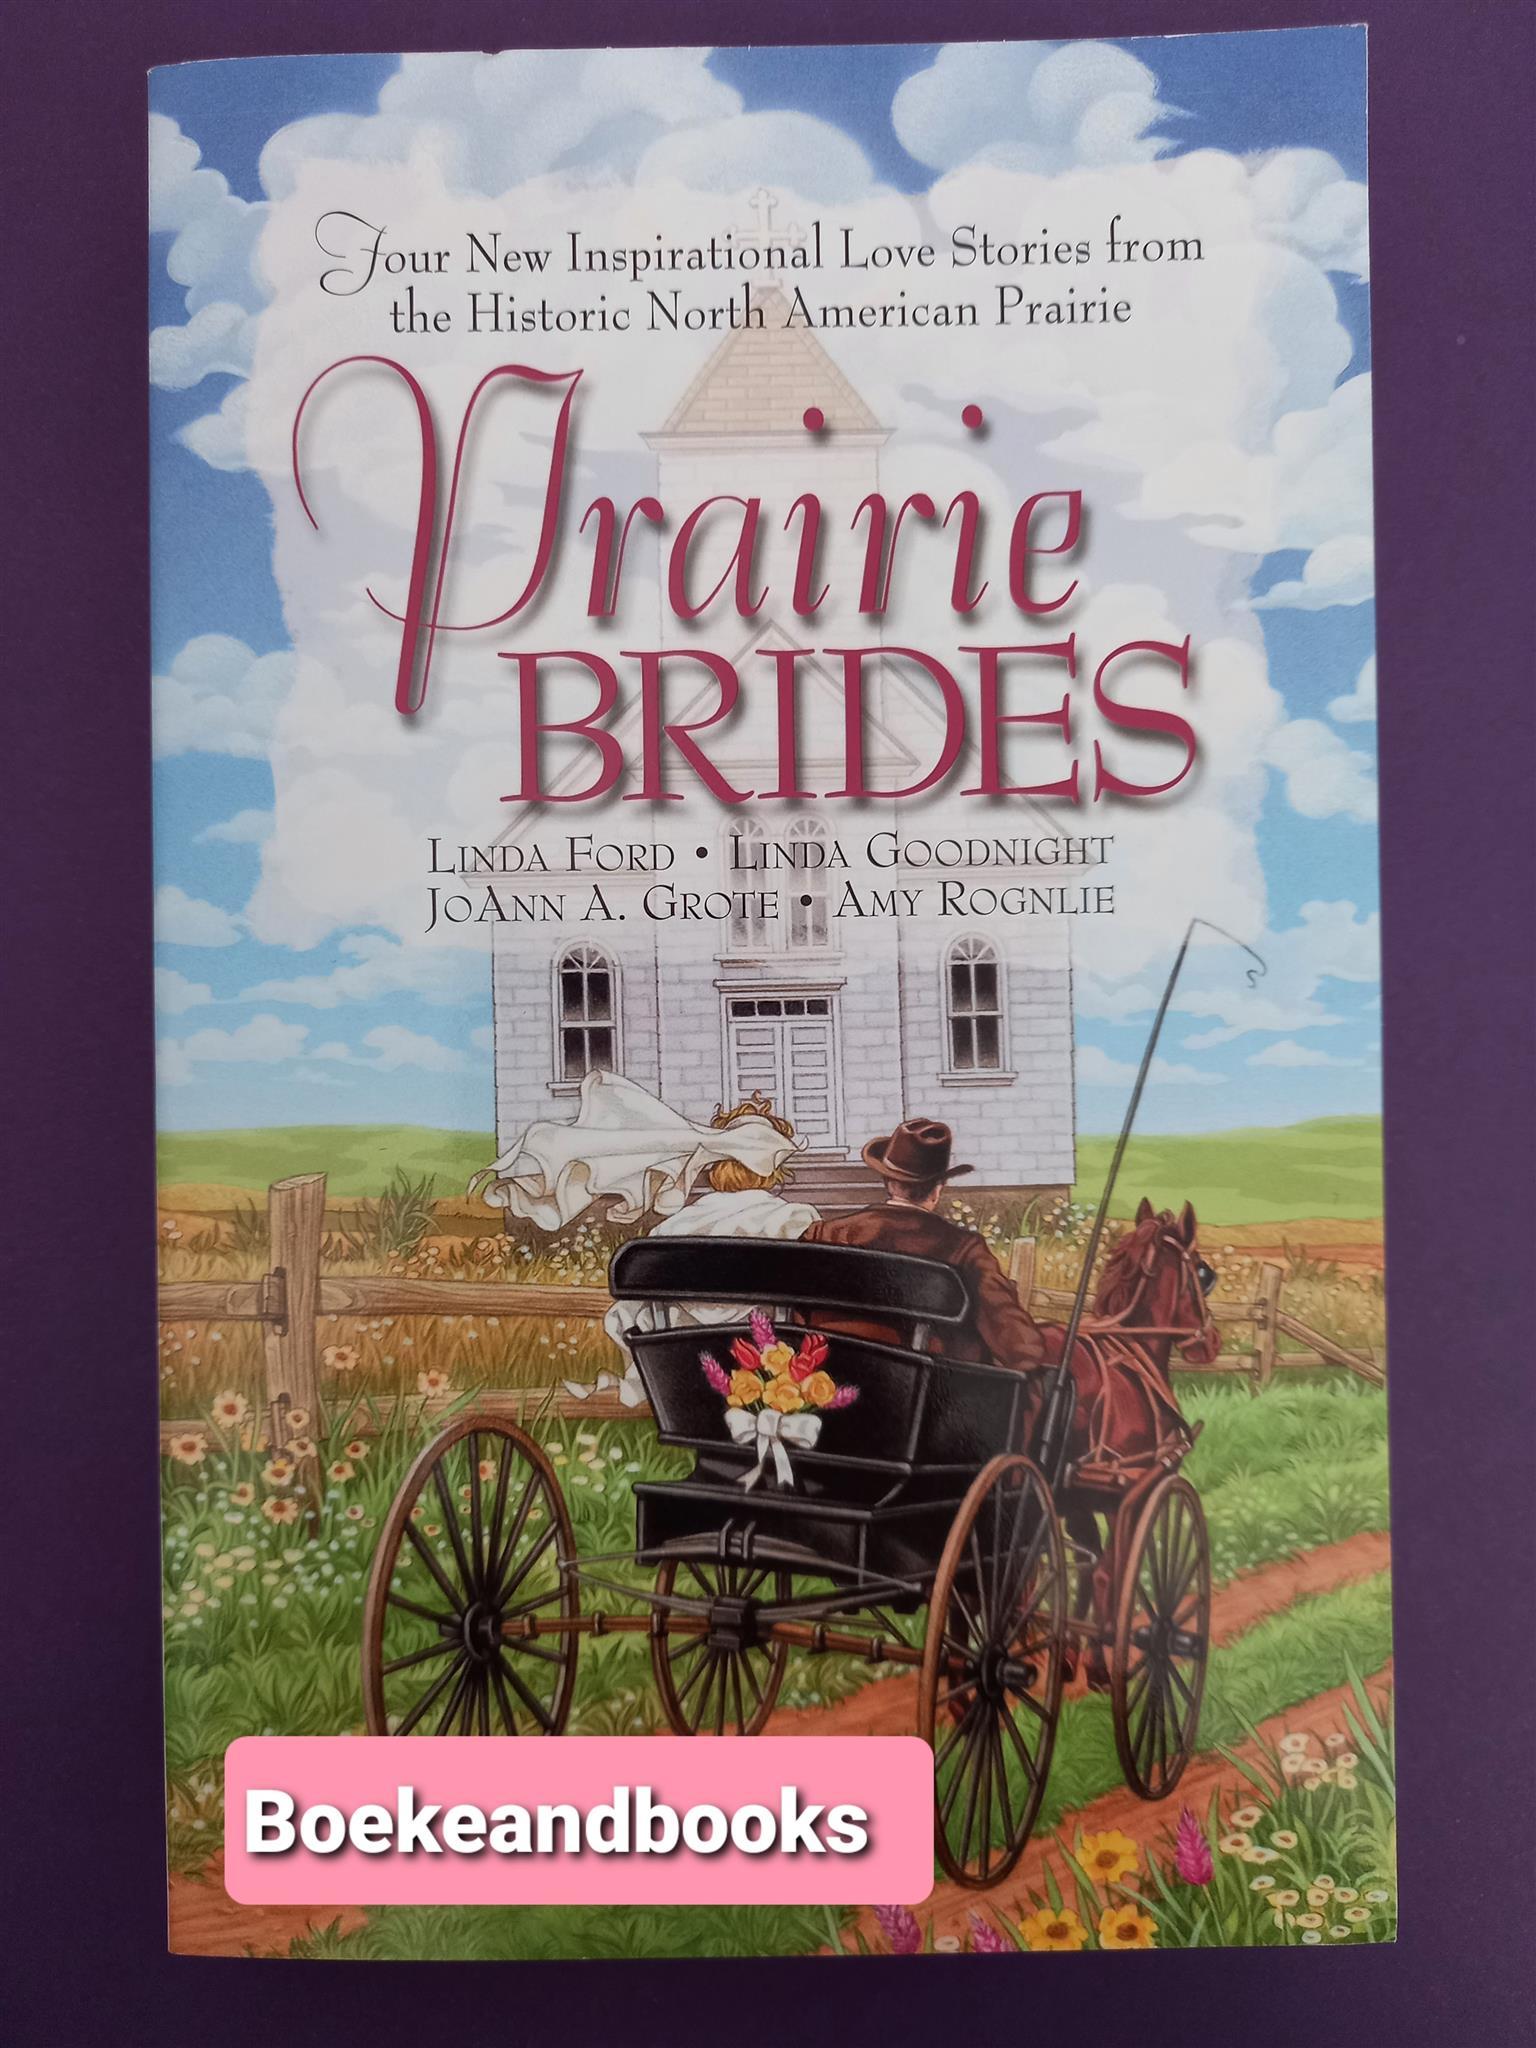 Prairie Brides - Linda Ford - Linda Goodnight - JoAnn A Grote - Amy Rognlie.